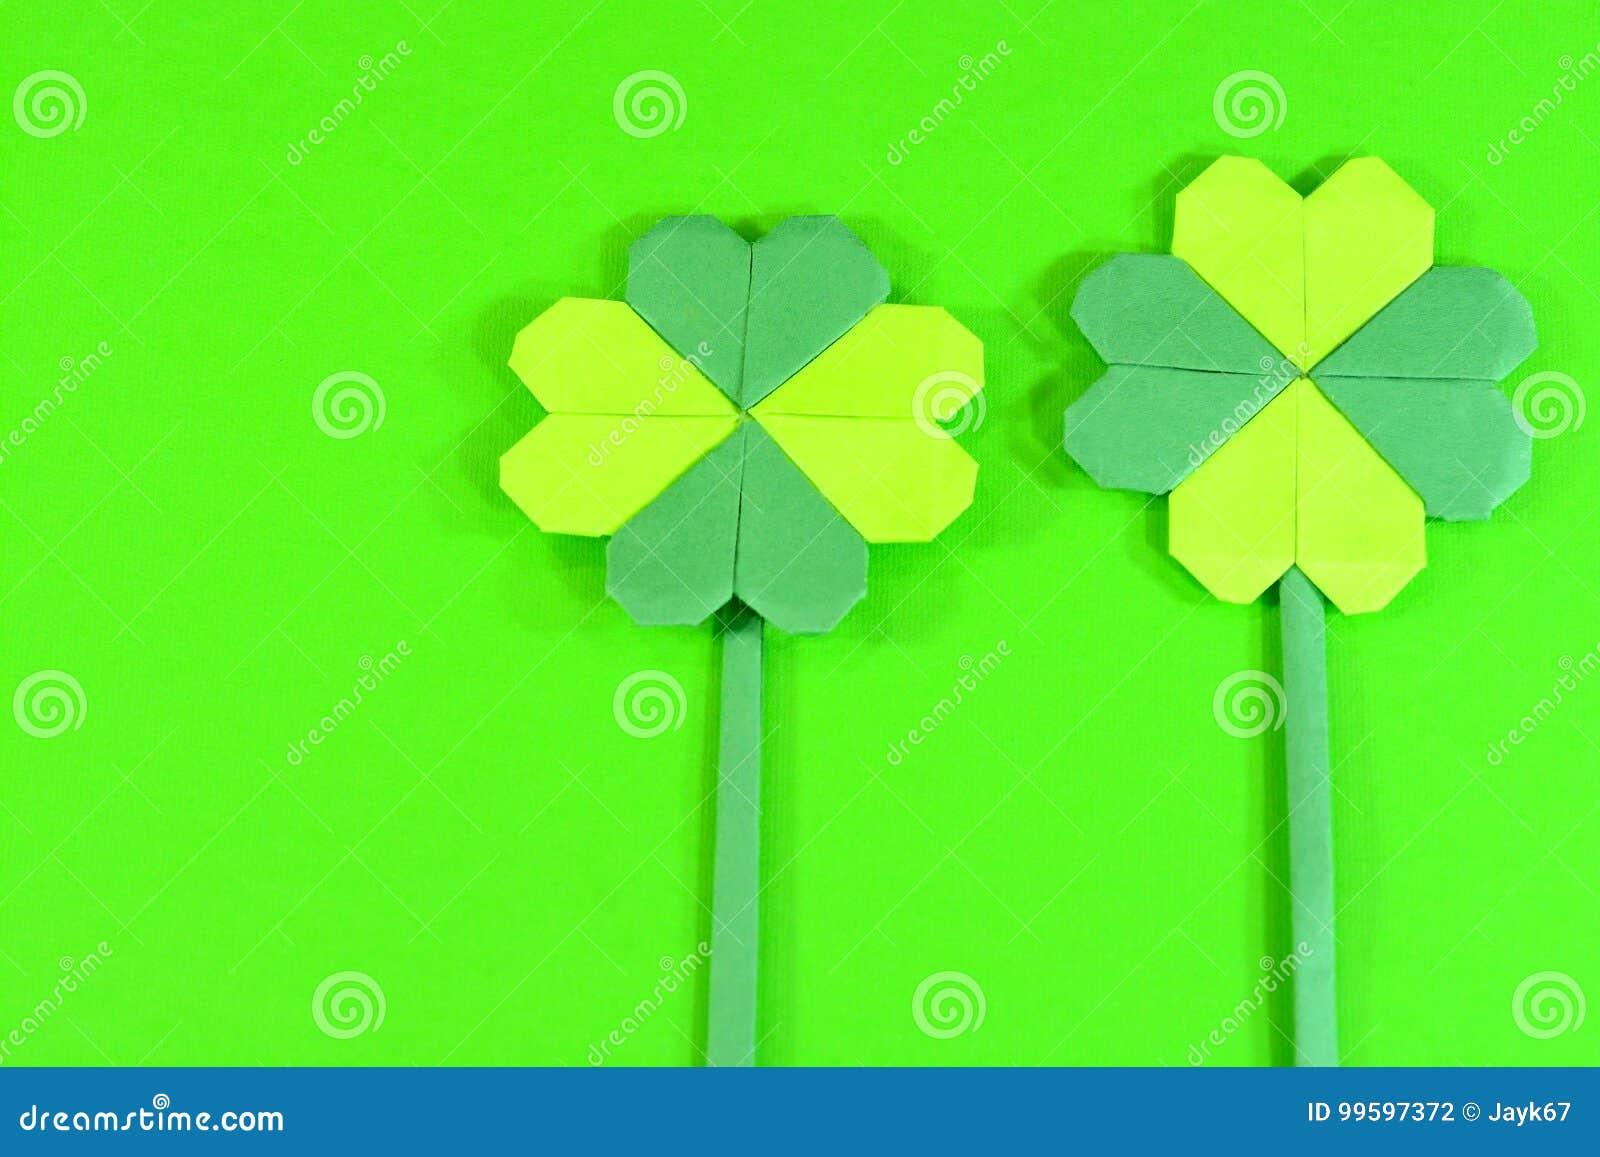 Origami 4 Leaf Clover- How to make an origami four leaf clover ... | 957x1300